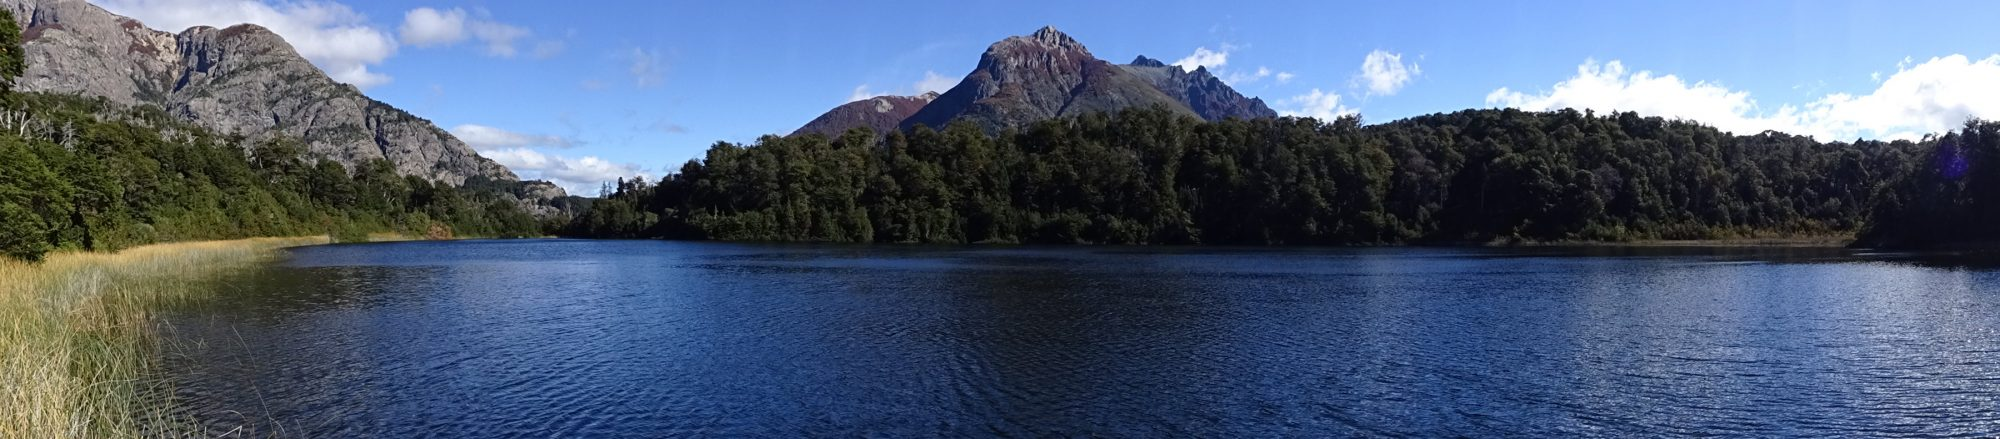 Fjella Bariloche Fahrradtour Ausflug Circuito Chico Fahrrad Patagonien Argentinische Schweiz